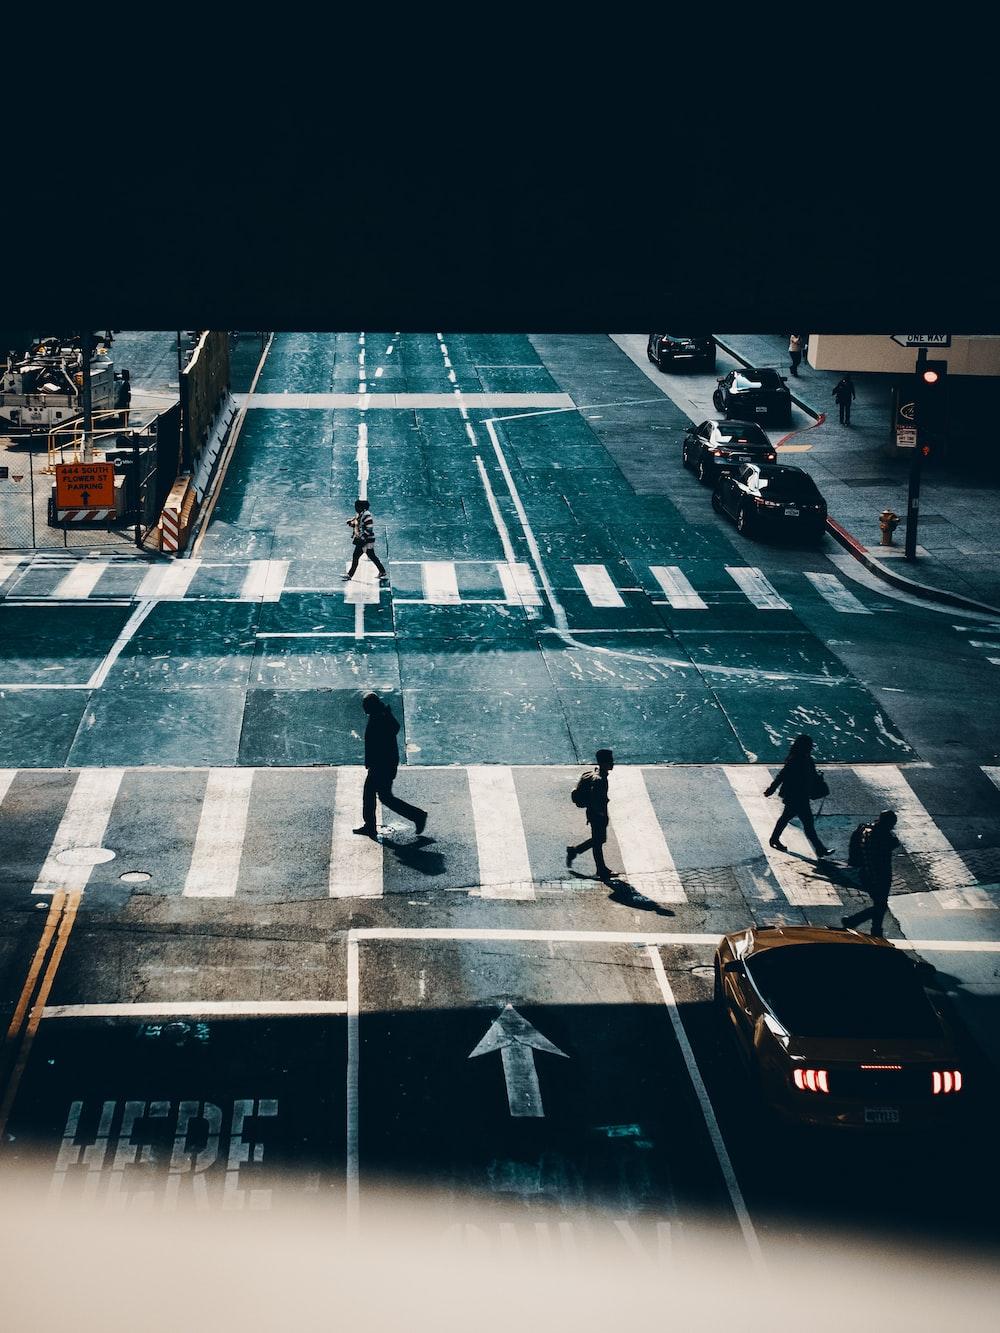 several person walking on pedestrian lane